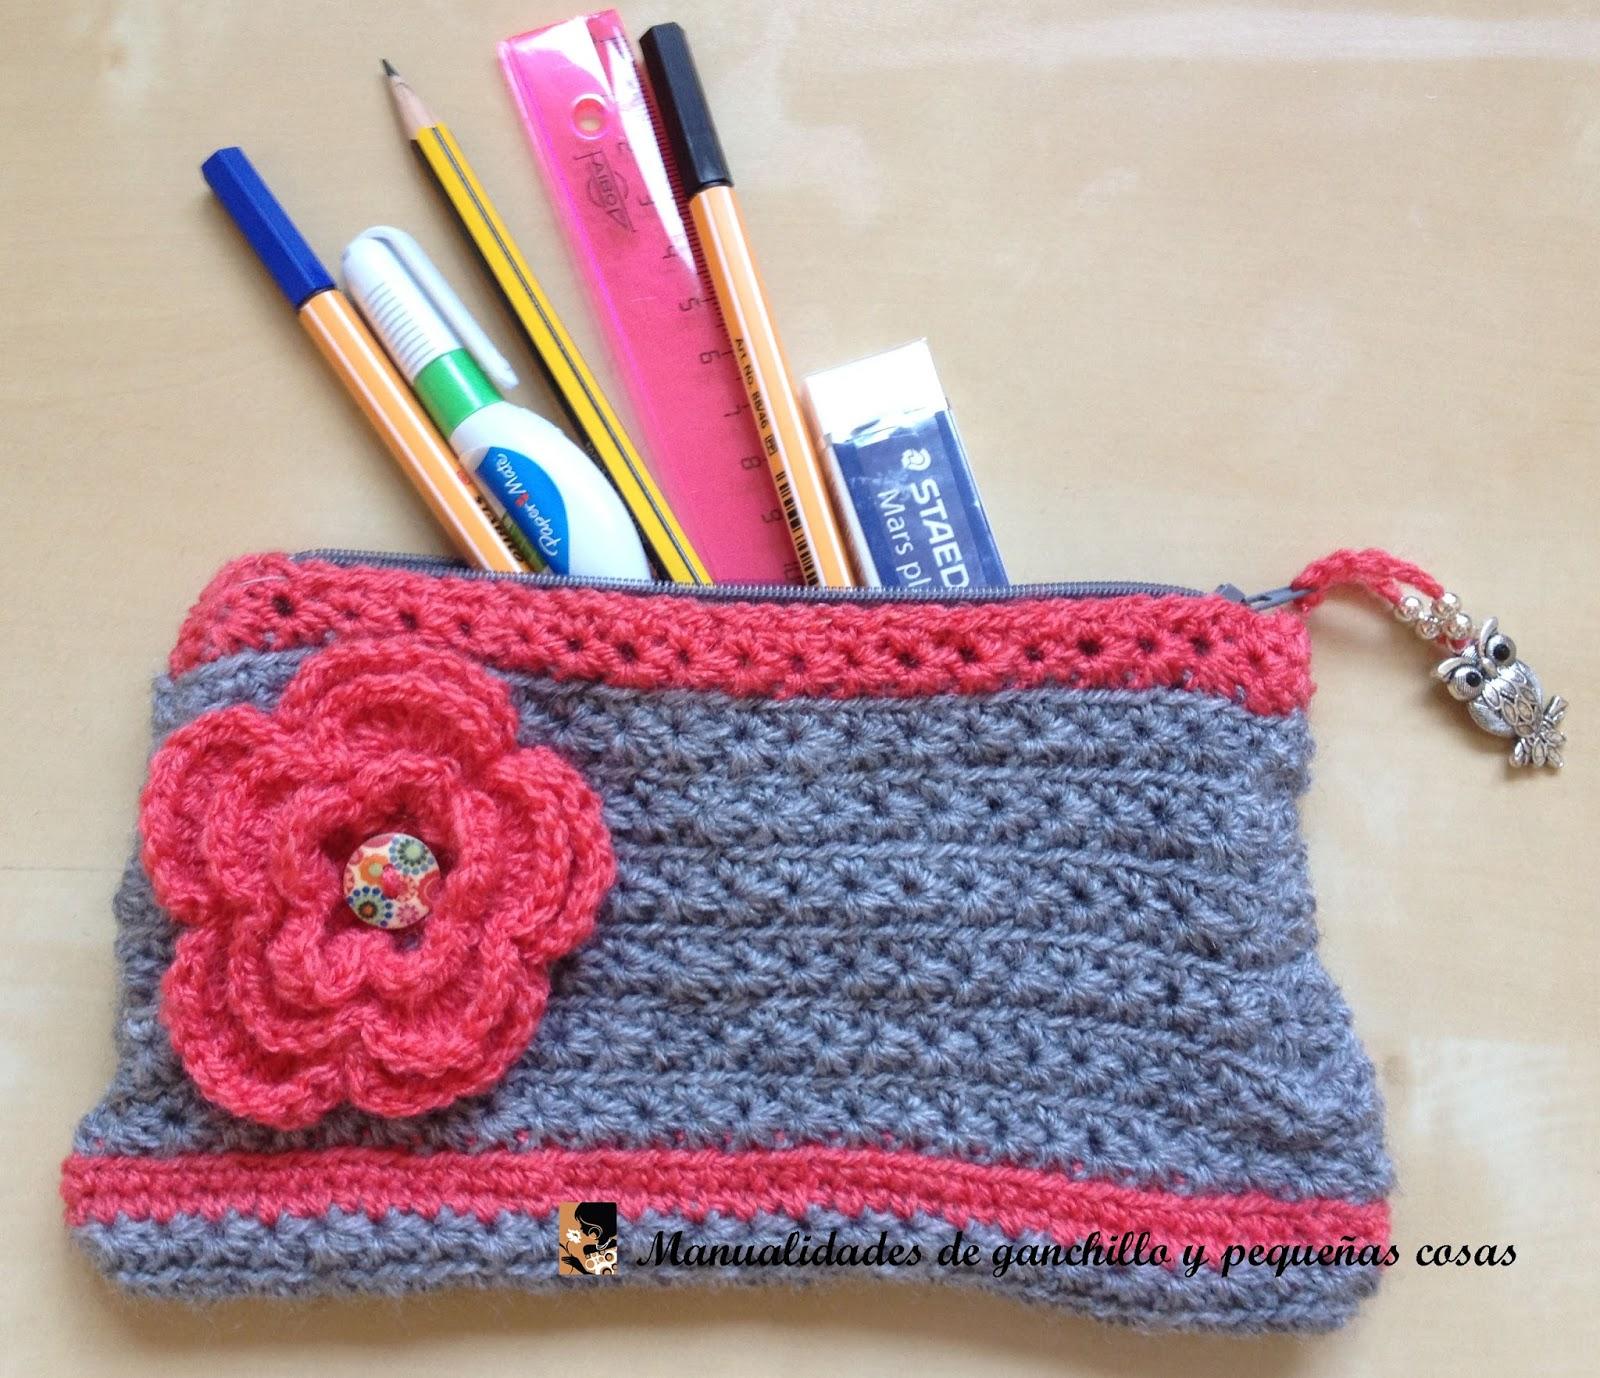 Manualidades en tela o crochet manualidades de ganchillo - Manualidades a ganchillo ...